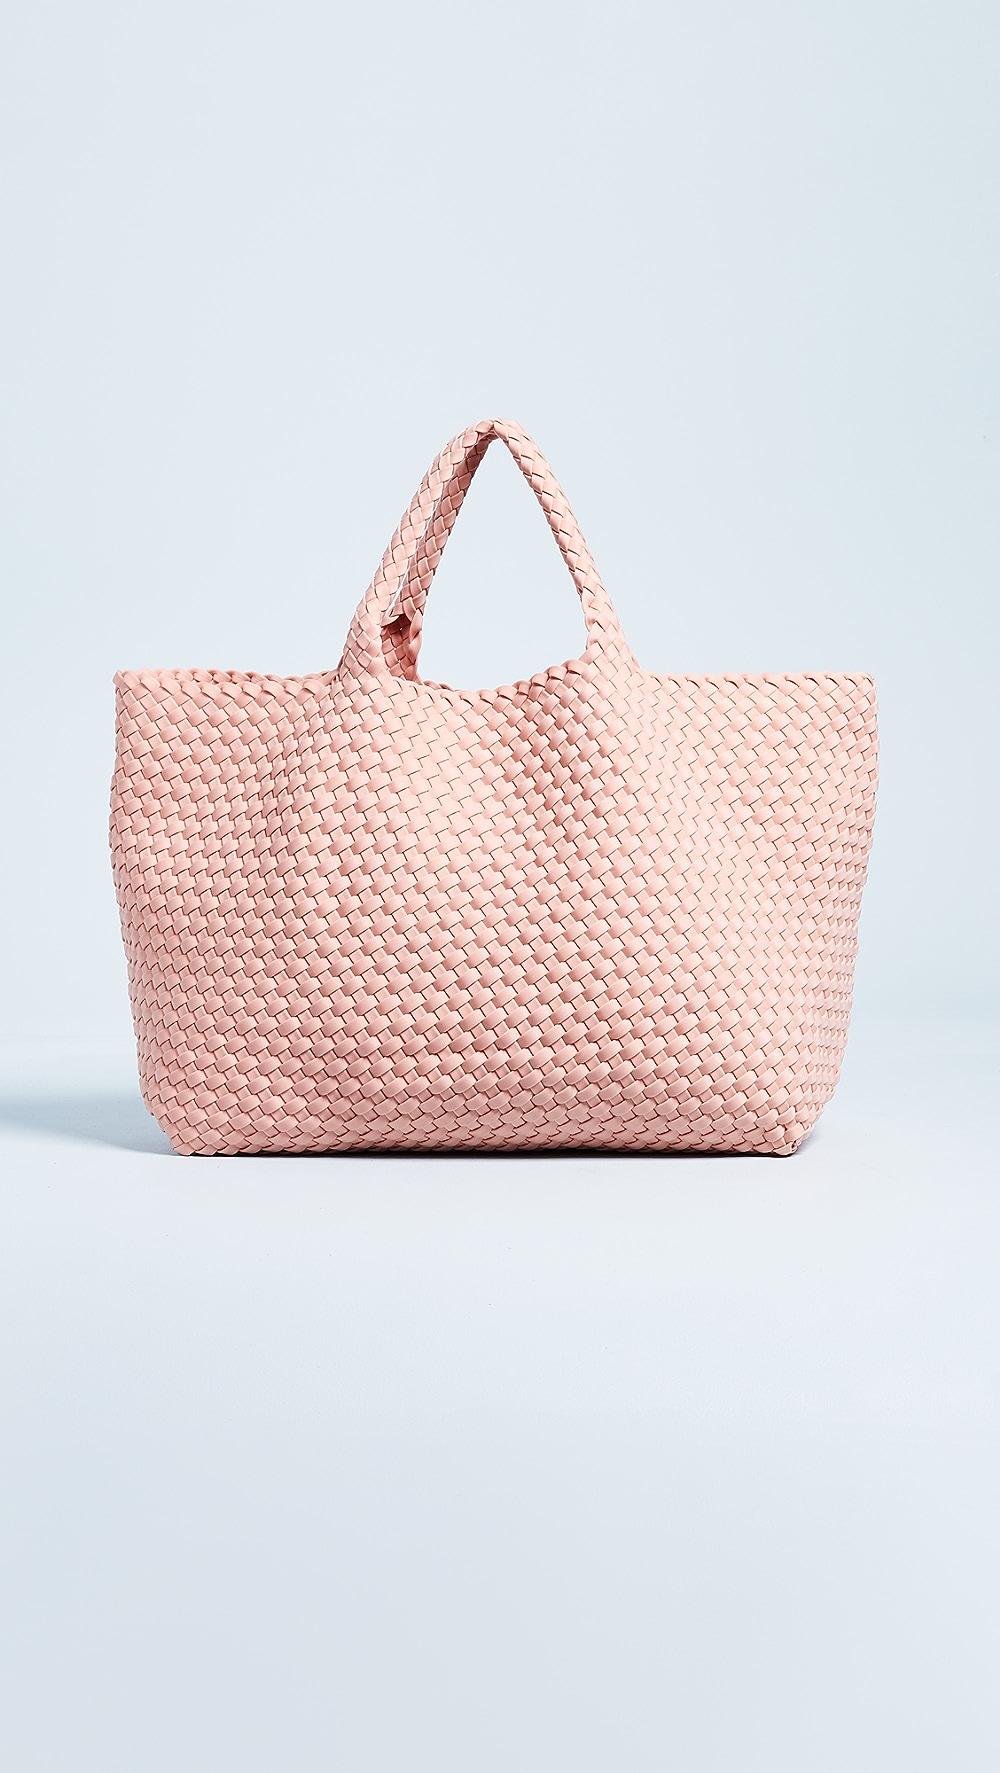 Aggressive Naghedi - St. Barths Medium Tote Bag Superior (In) Quality